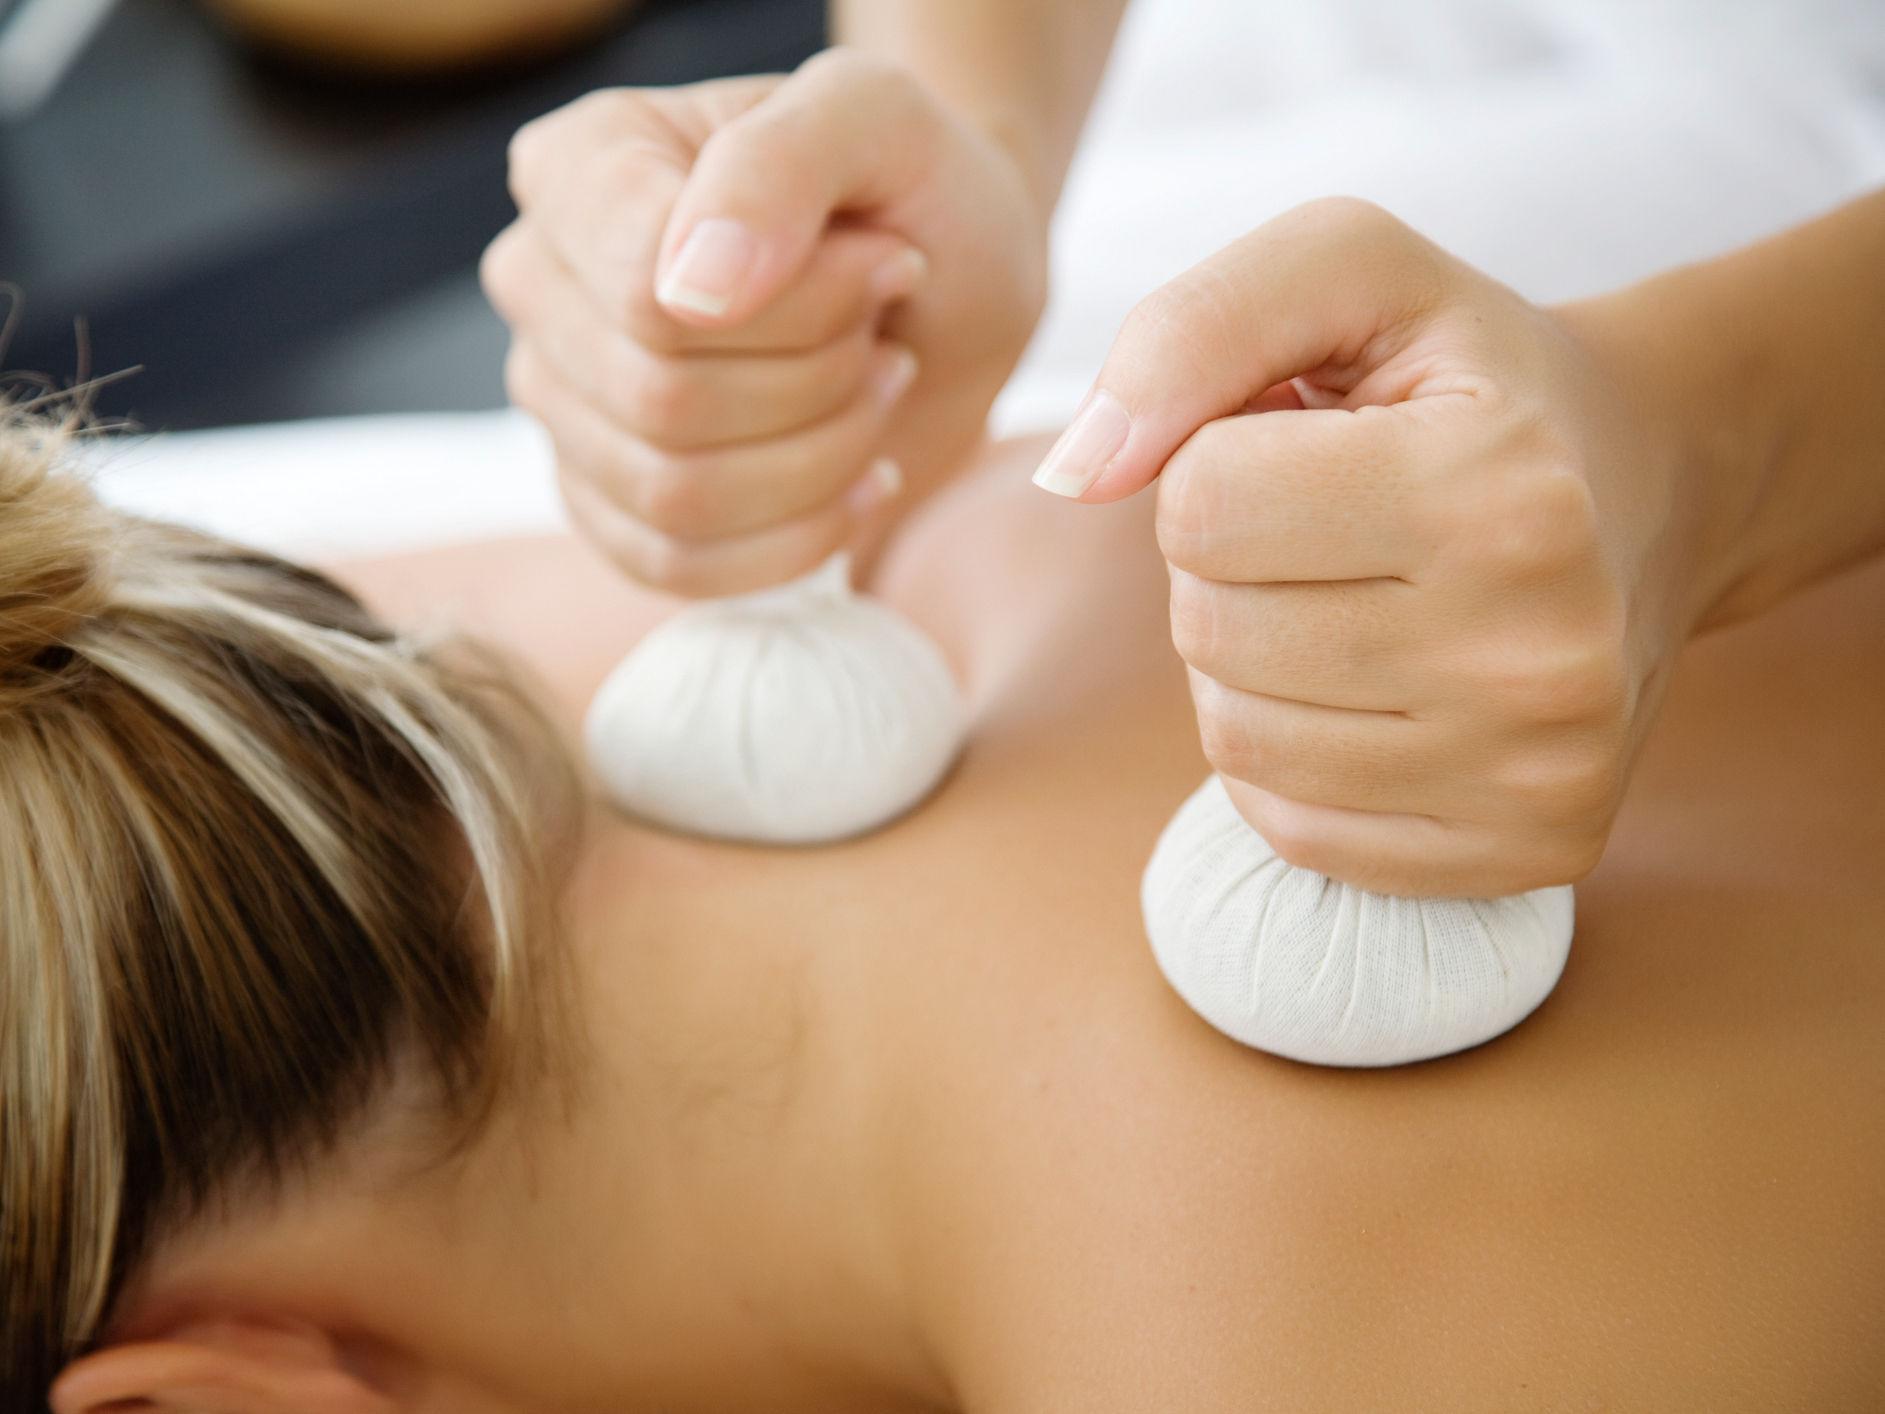 Тайский массаж онлайн 16 фотография